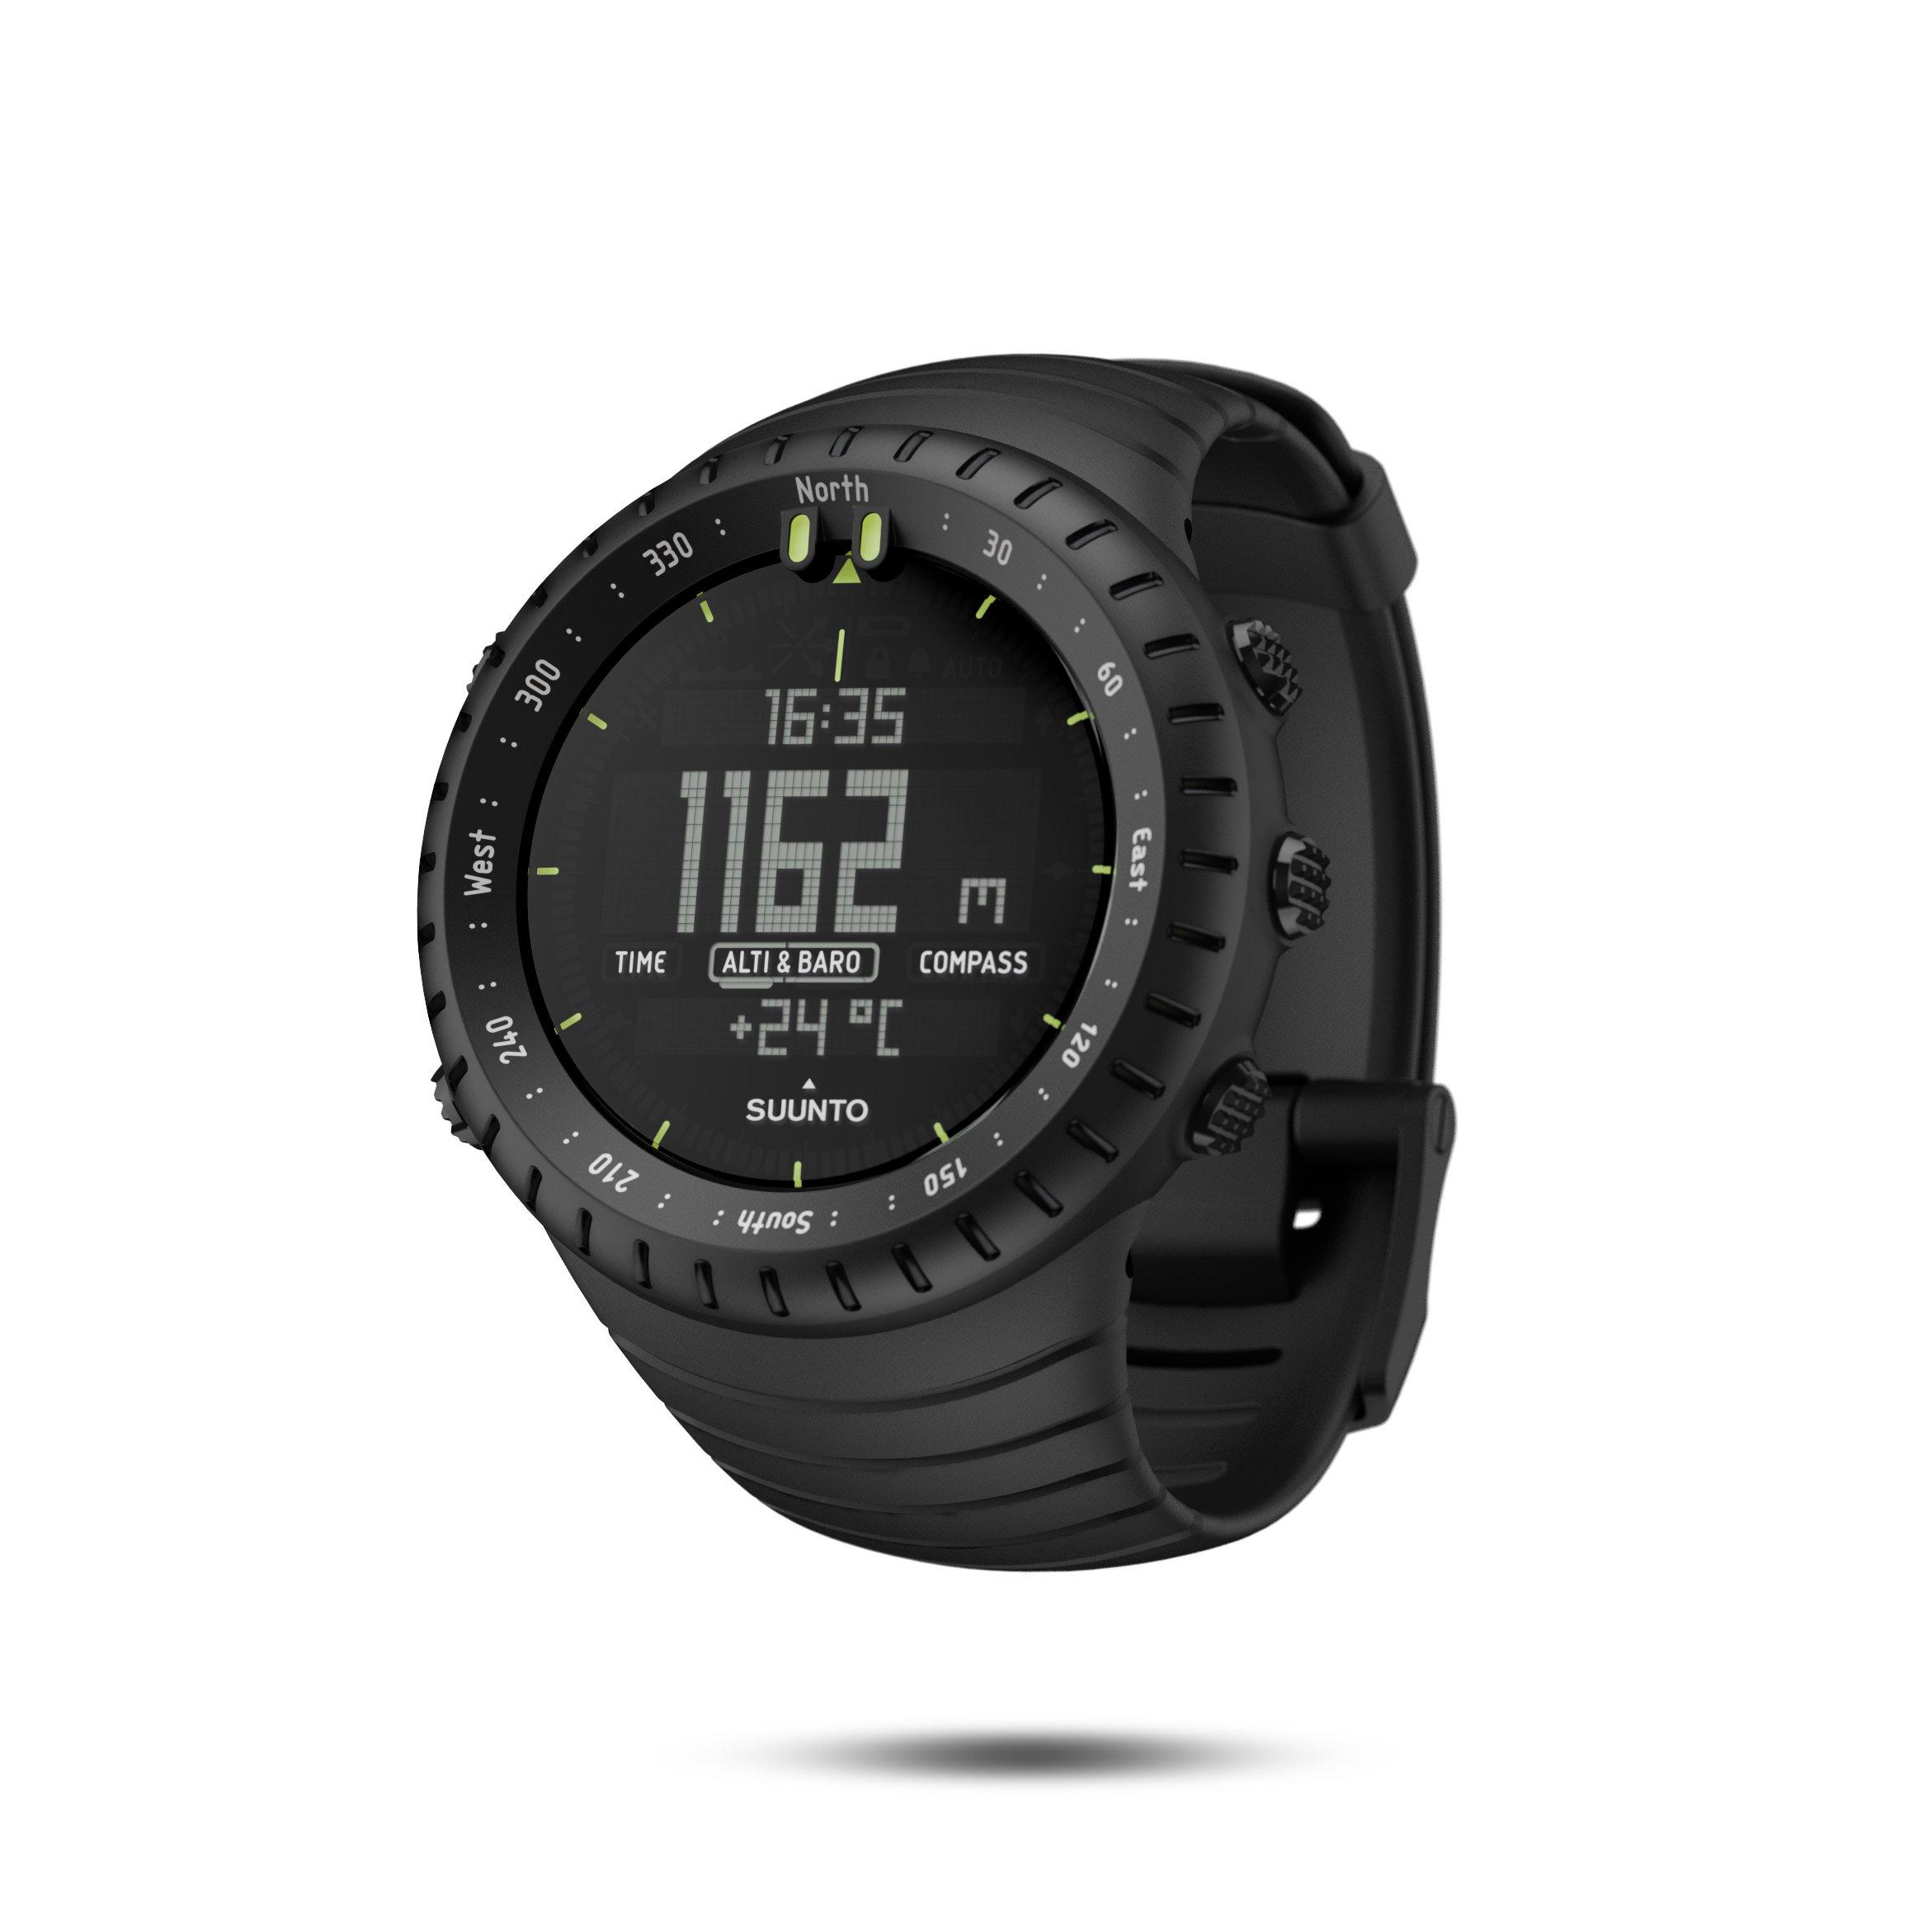 Suunto Core All Black Military Men's Outdoor Sports Watch - SS014279010 by Suunto (Image #4)